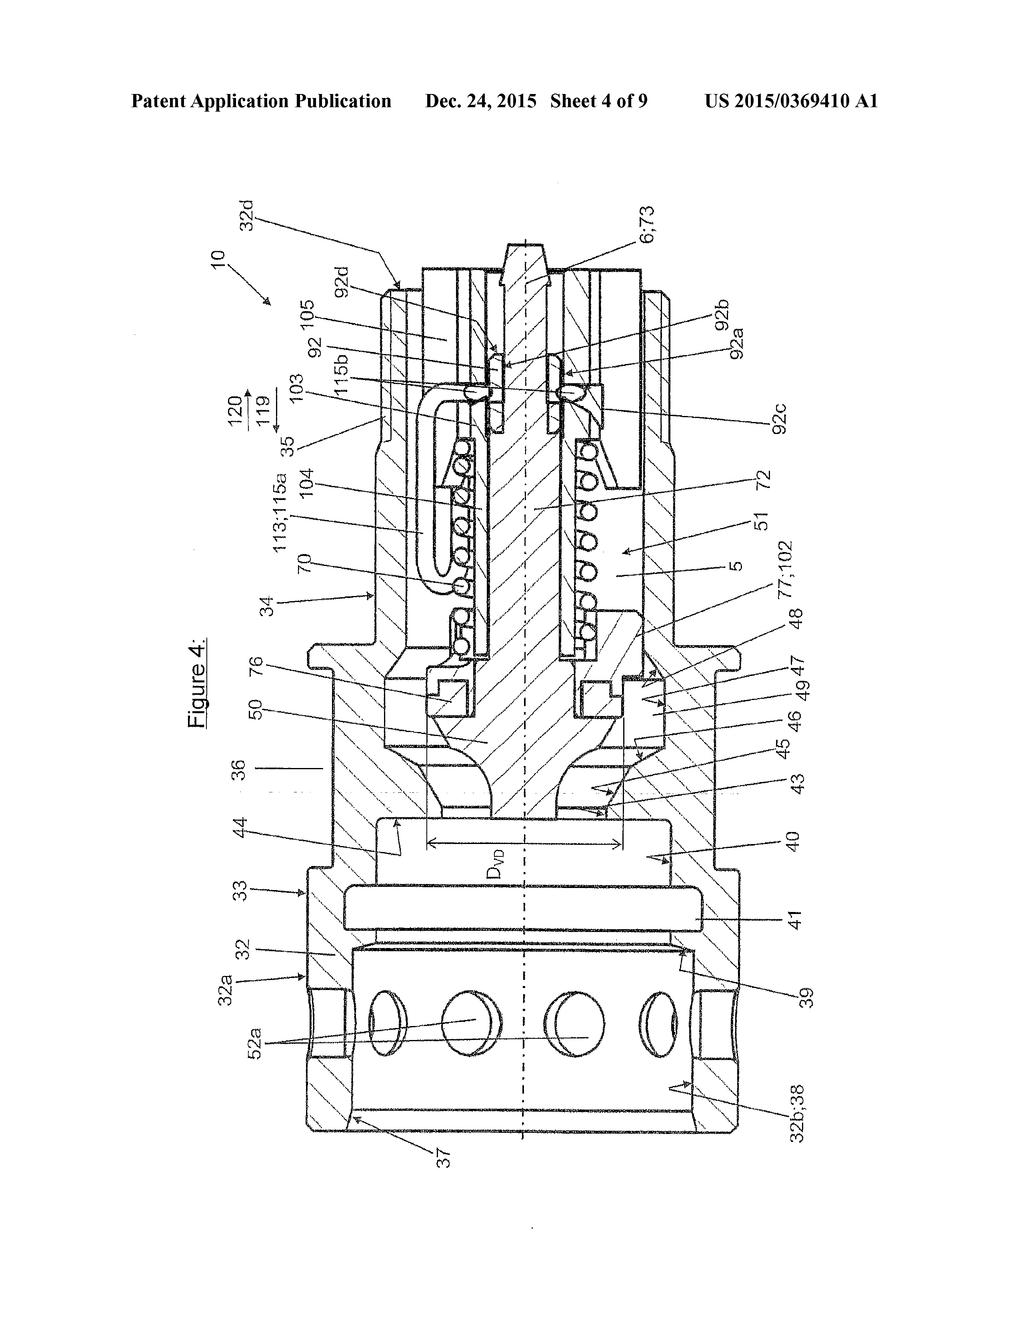 Diagram 1992 Ford F 150 Fuel Sensor Wiring Diagram Full Version Hd Quality Wiring Diagram Diagramcooph Avvocatomariazingaropoli It